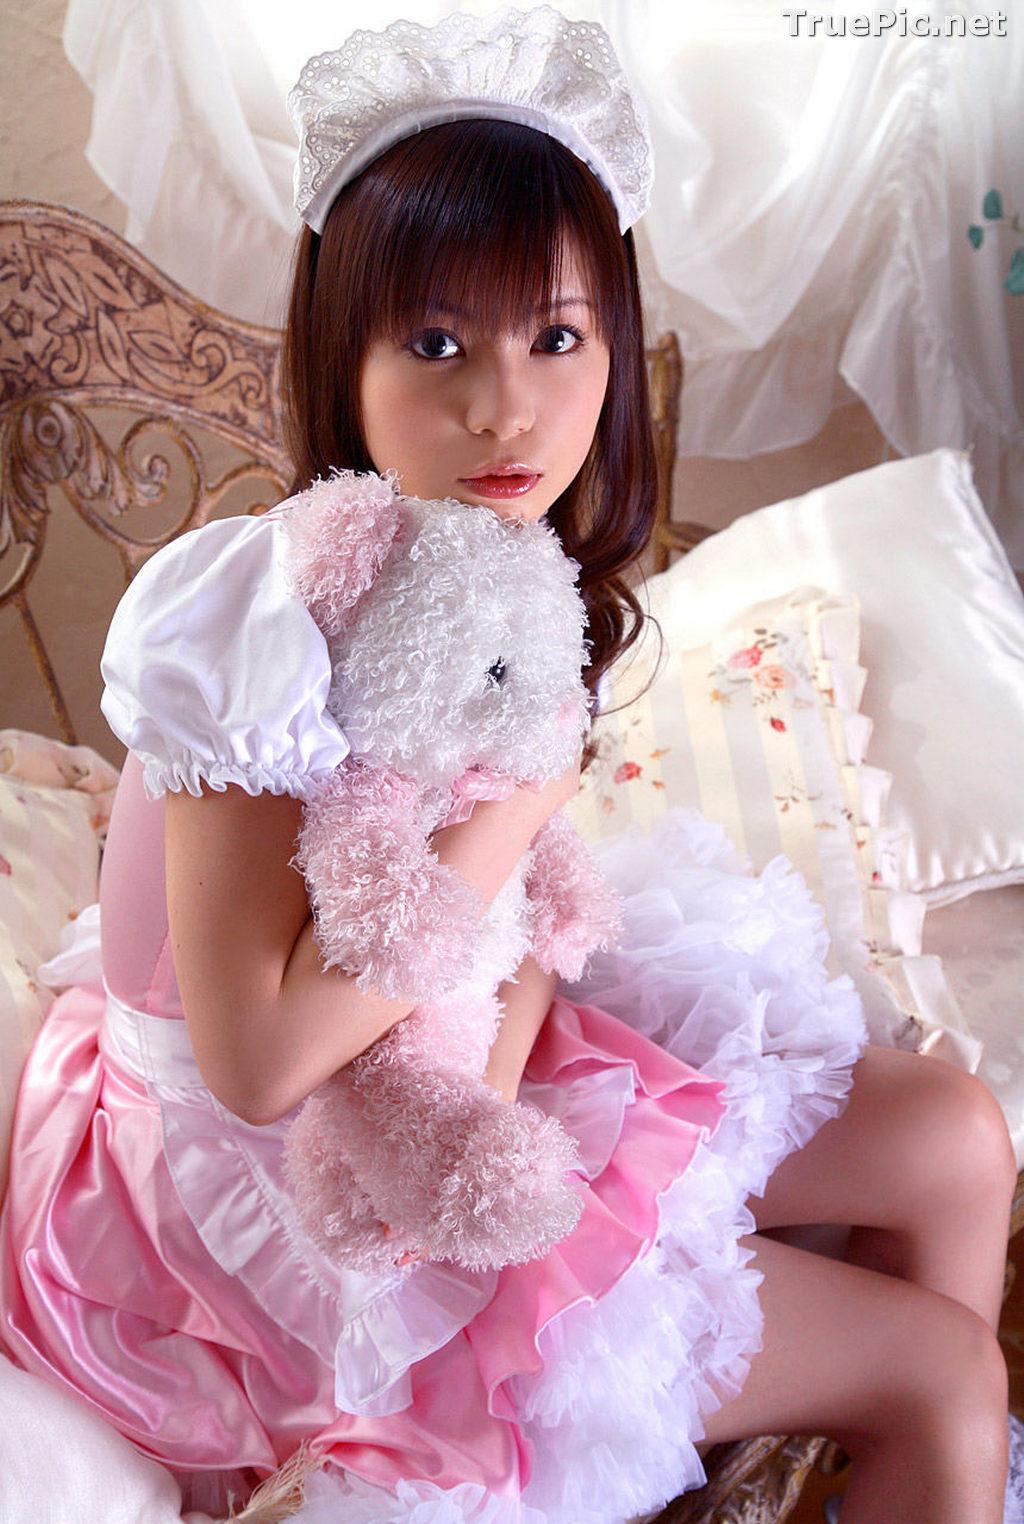 Image Japanese Tarento and Actress - Shoko Nakagawa - Shoko Pre Photo Collection - TruePic.net - Picture-2